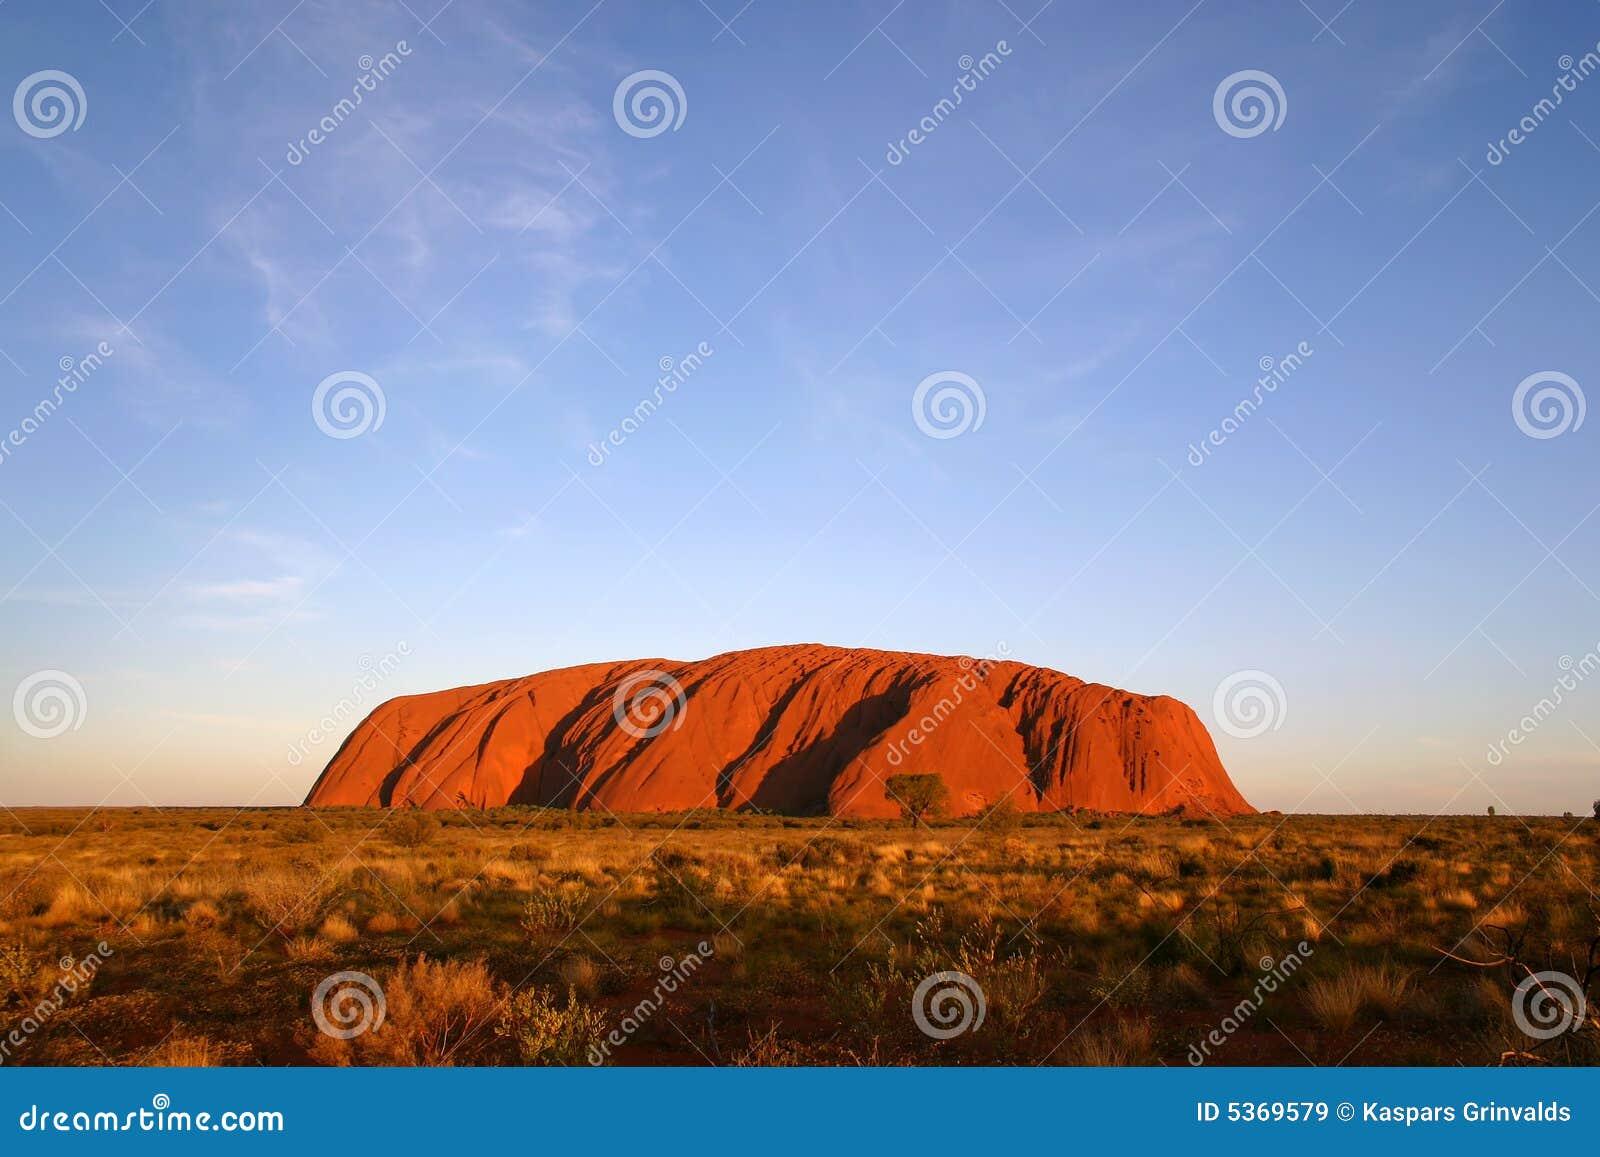 Ayers rock uluru australii